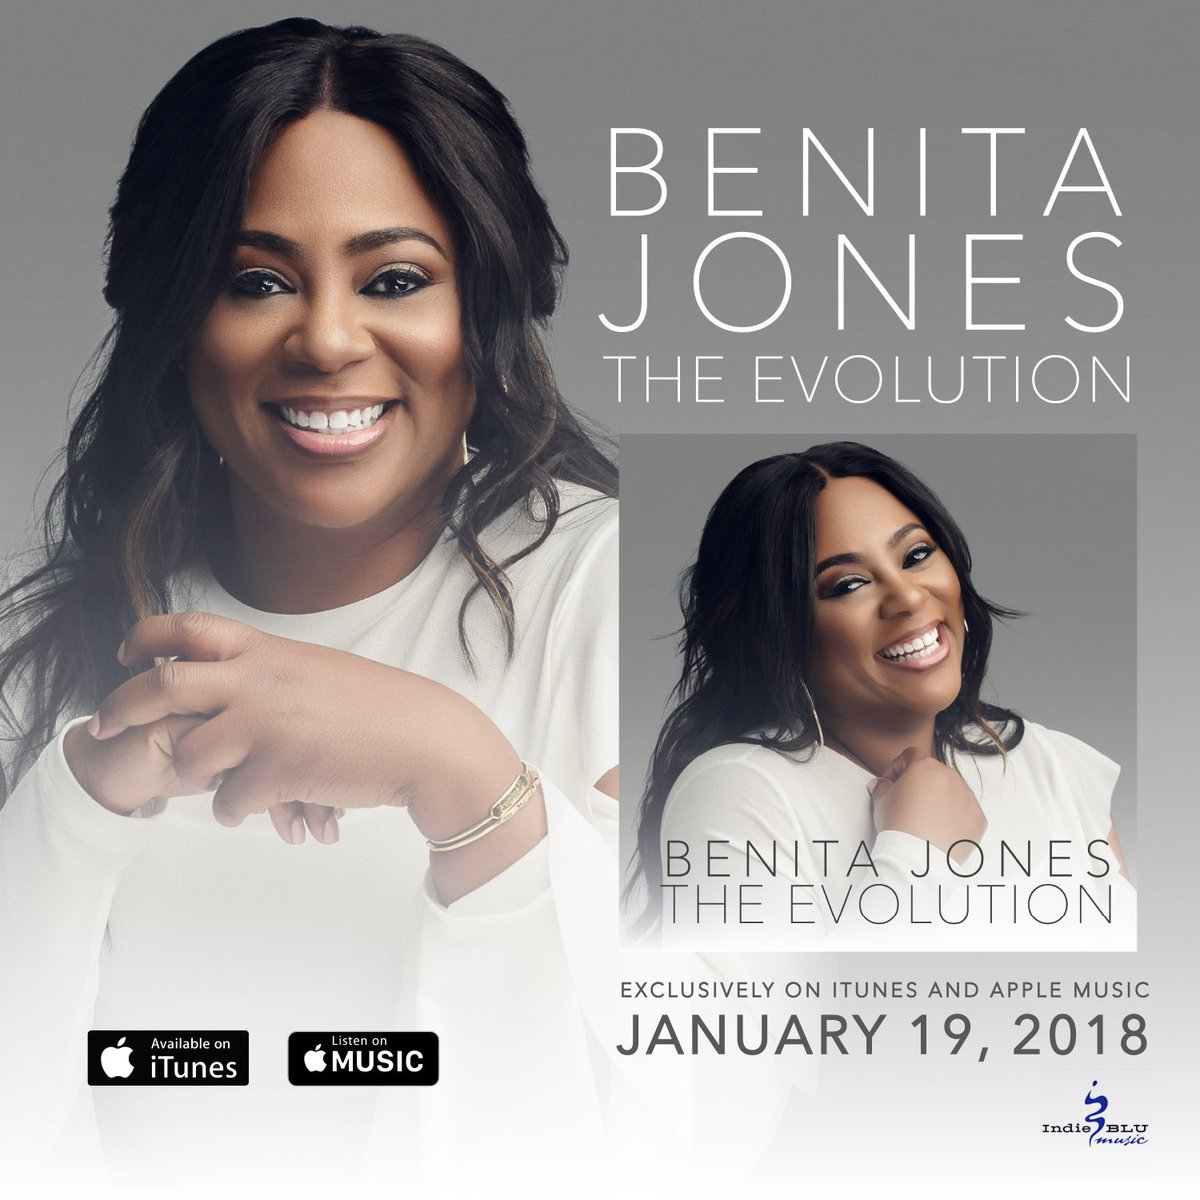 benita jones, 2018 [ indie blu music ]